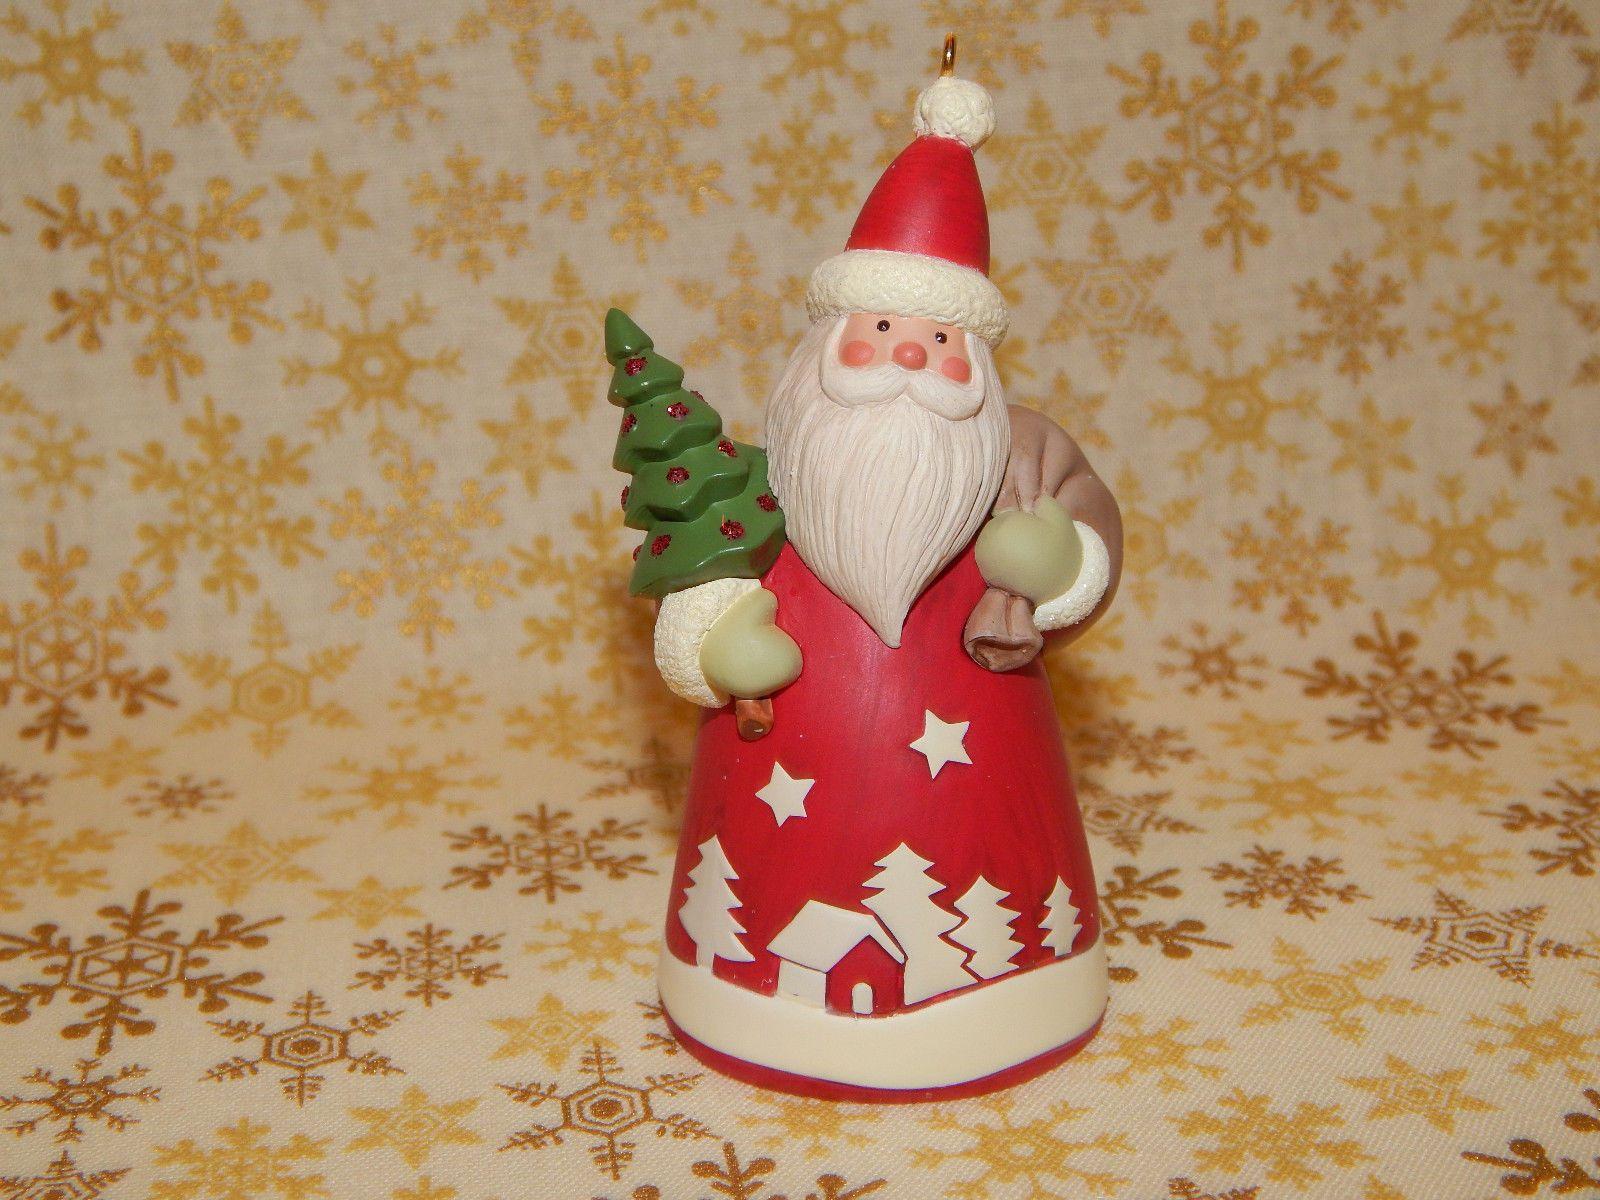 Hallmark Ornament 2006 St Nick Santa Claus 466 | eBay